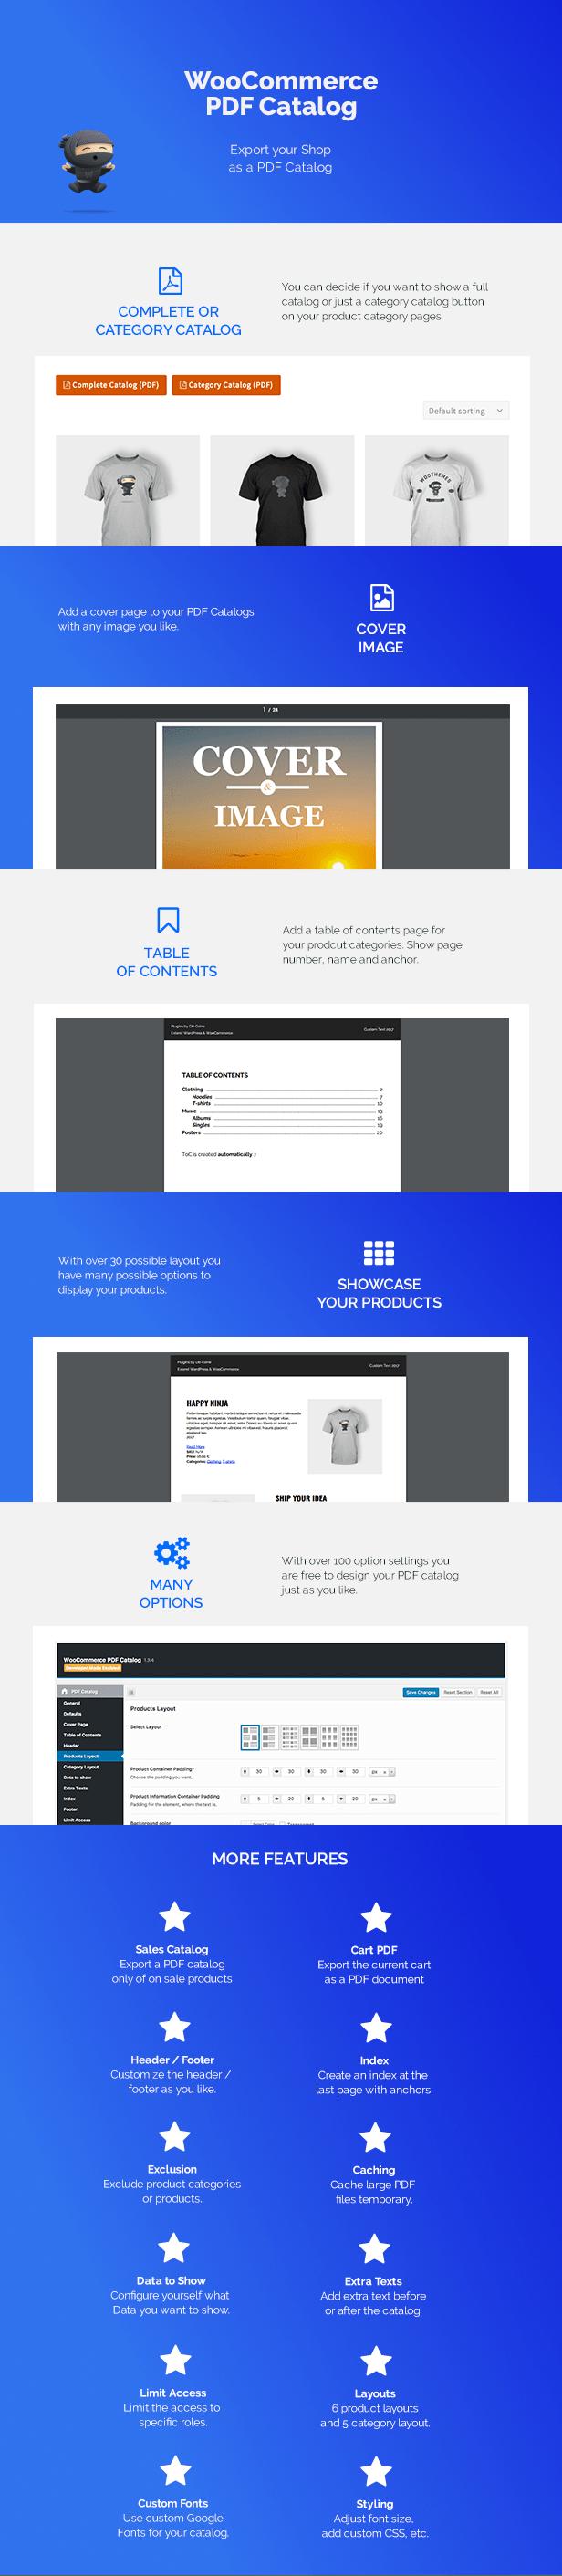 WooCommerce PDF Catalog Features